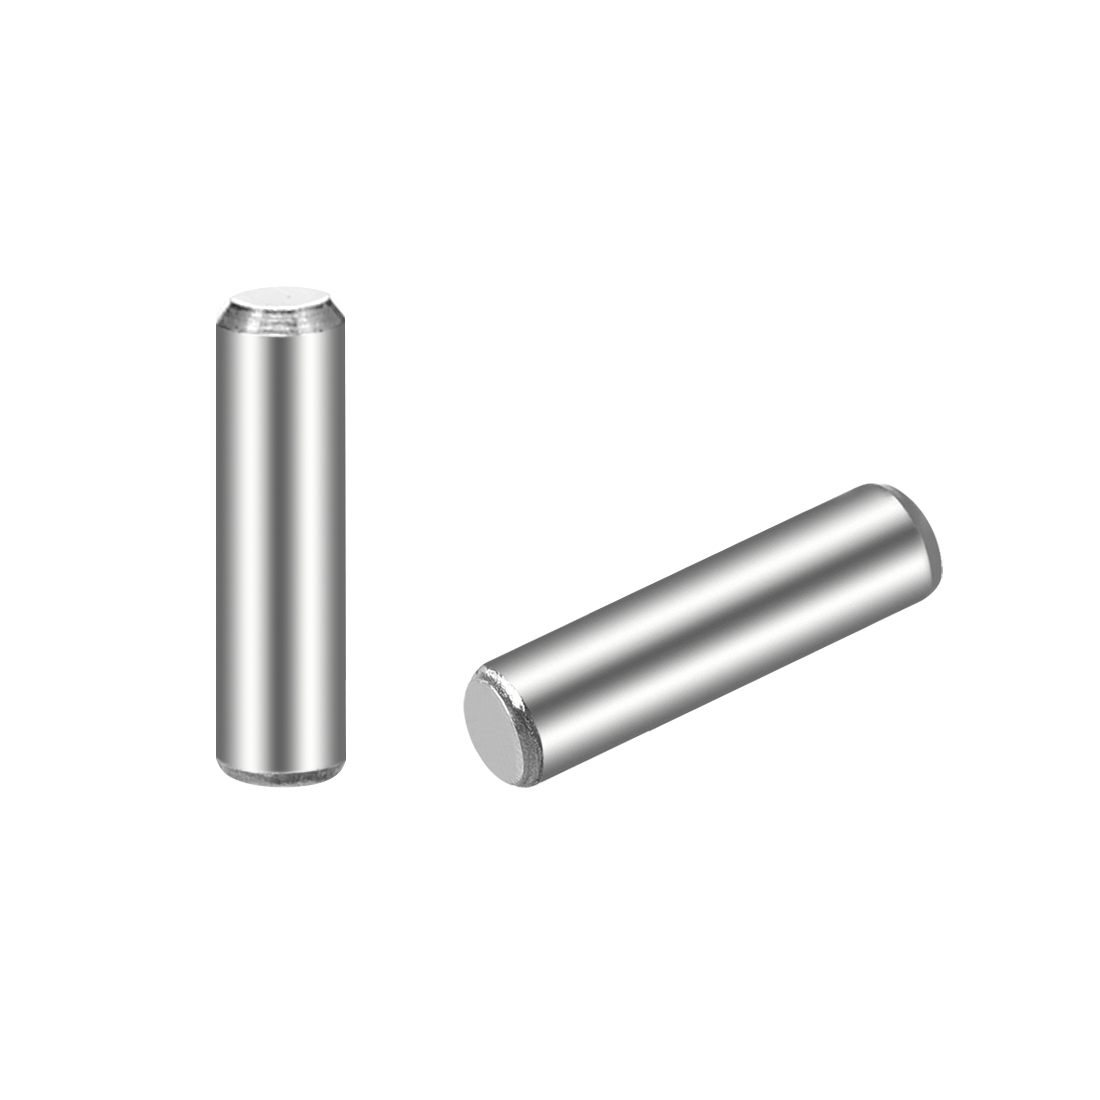 25Pcs 3mm x 12mm Dowel Pin 304 Stainless Steel Shelf Support Pin Fasten